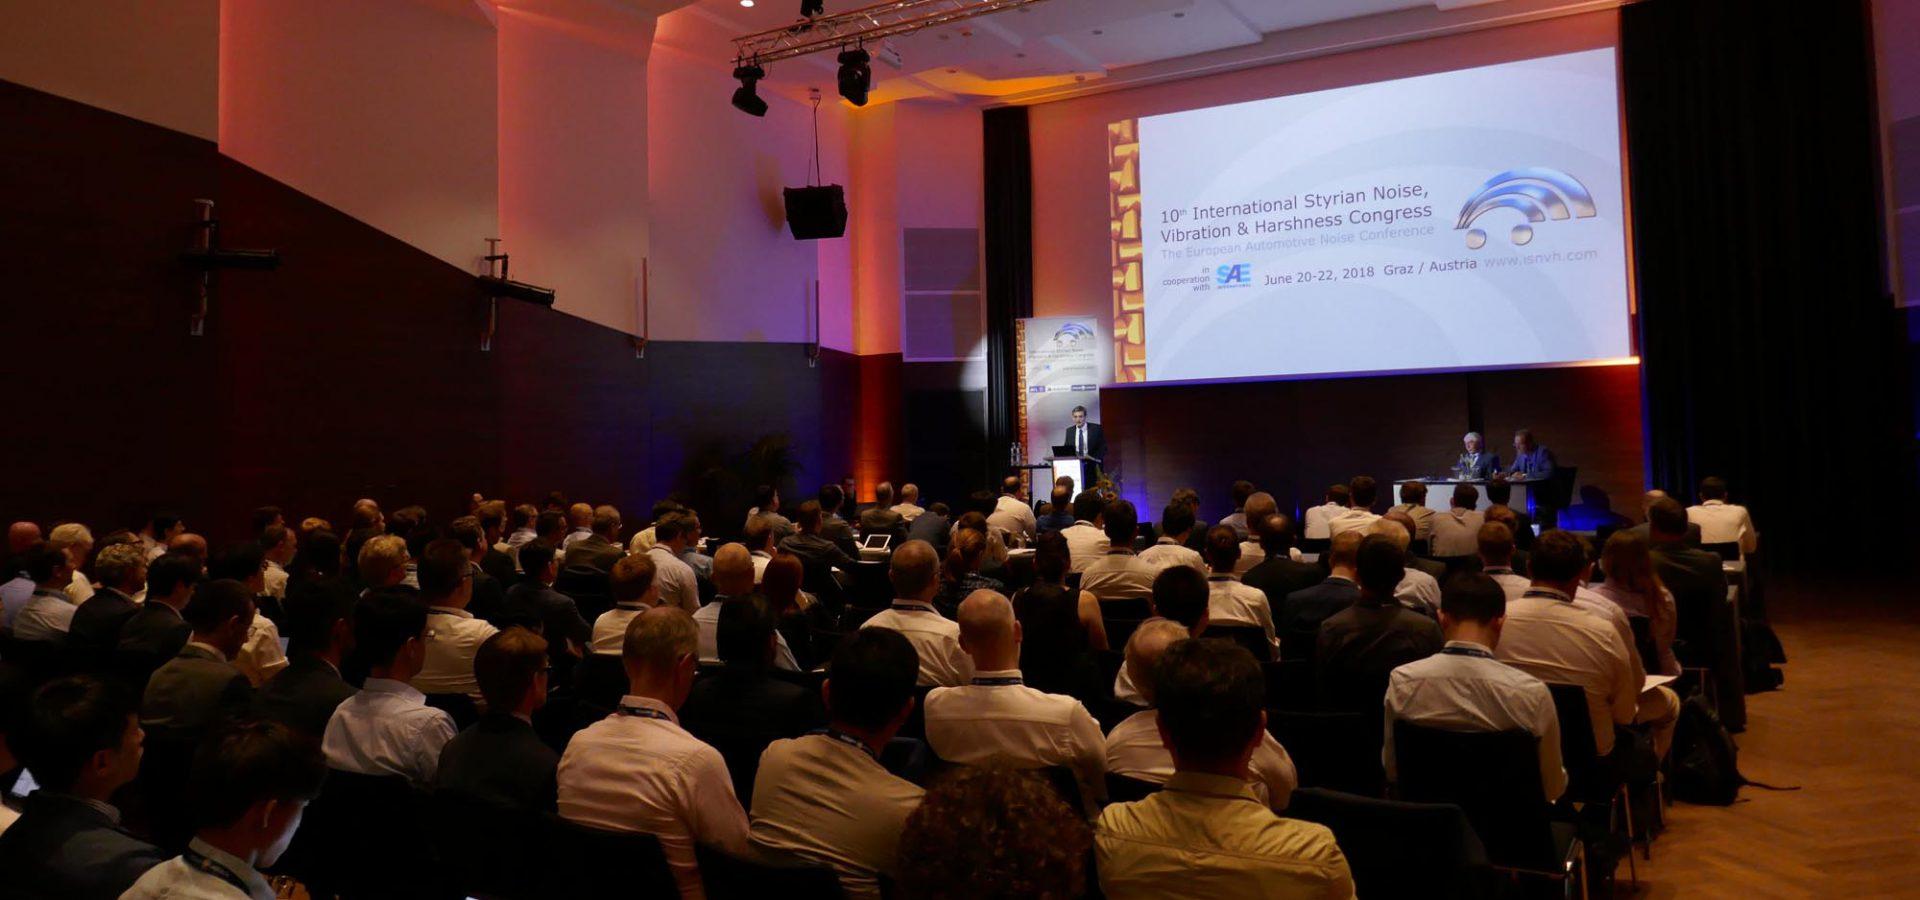 International Styrian Noise, Vibration & Harshness Congress 2020, Graz, Österreich